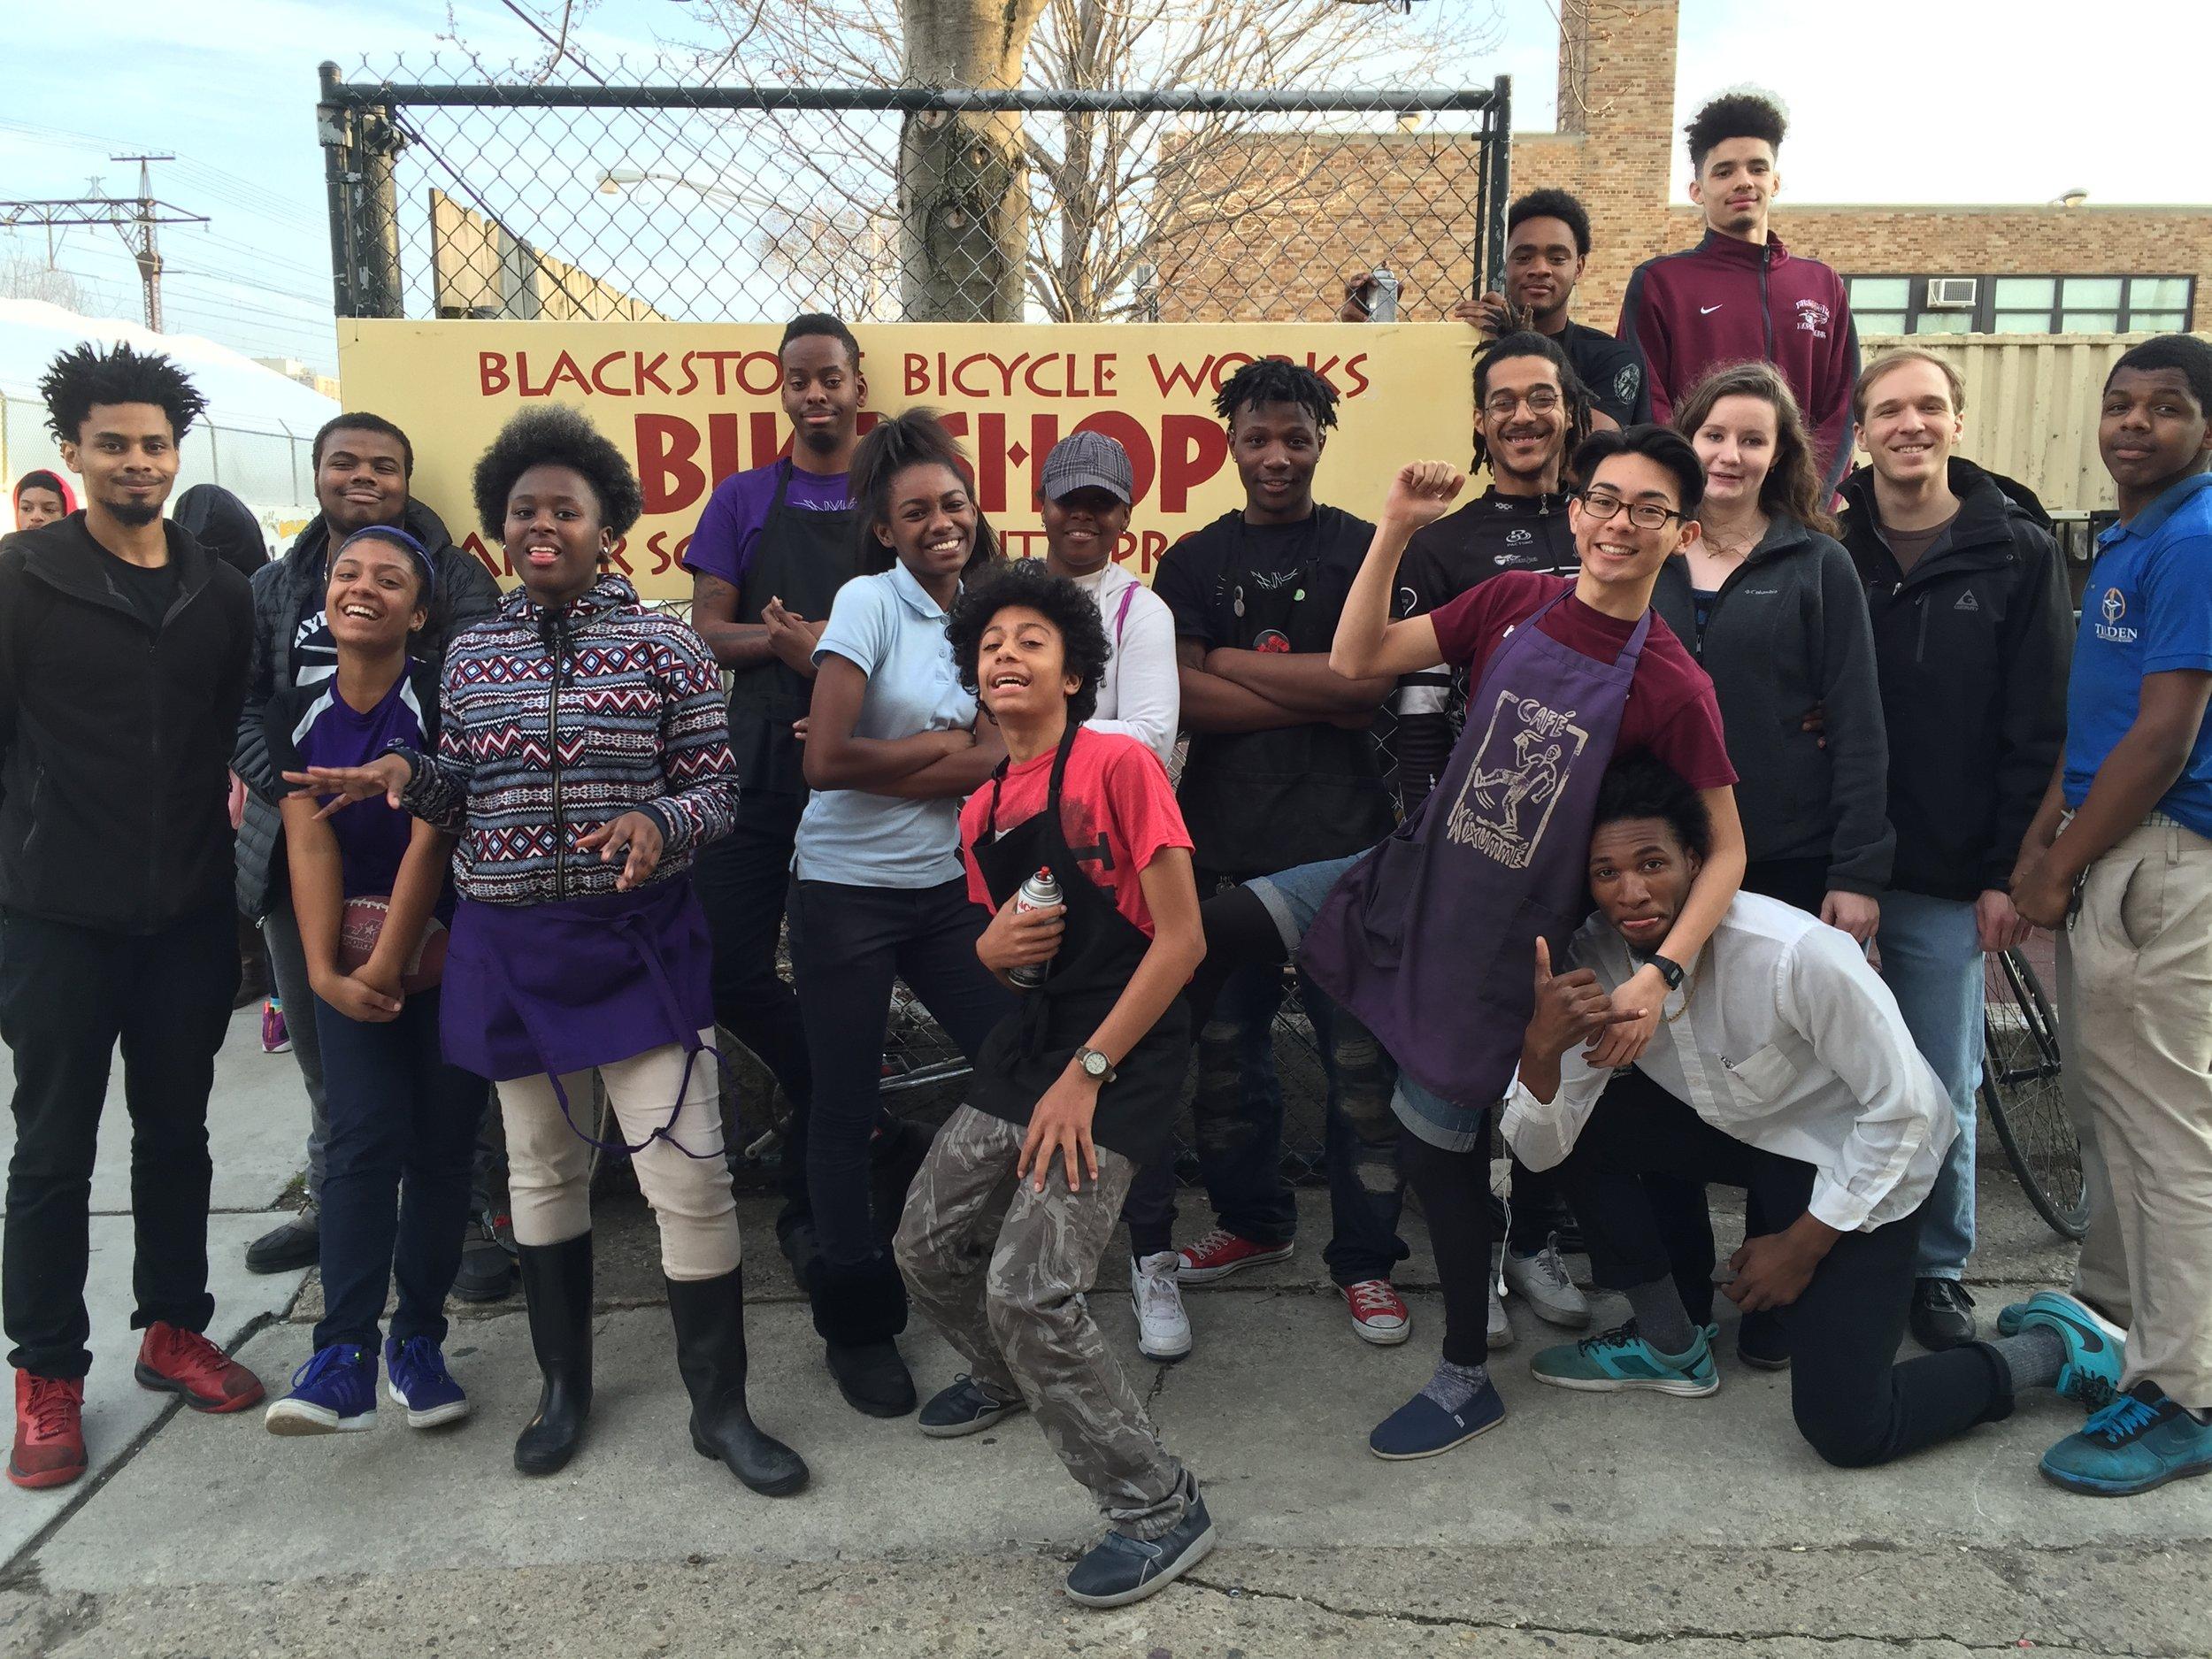 Blackstone Bikes Youth